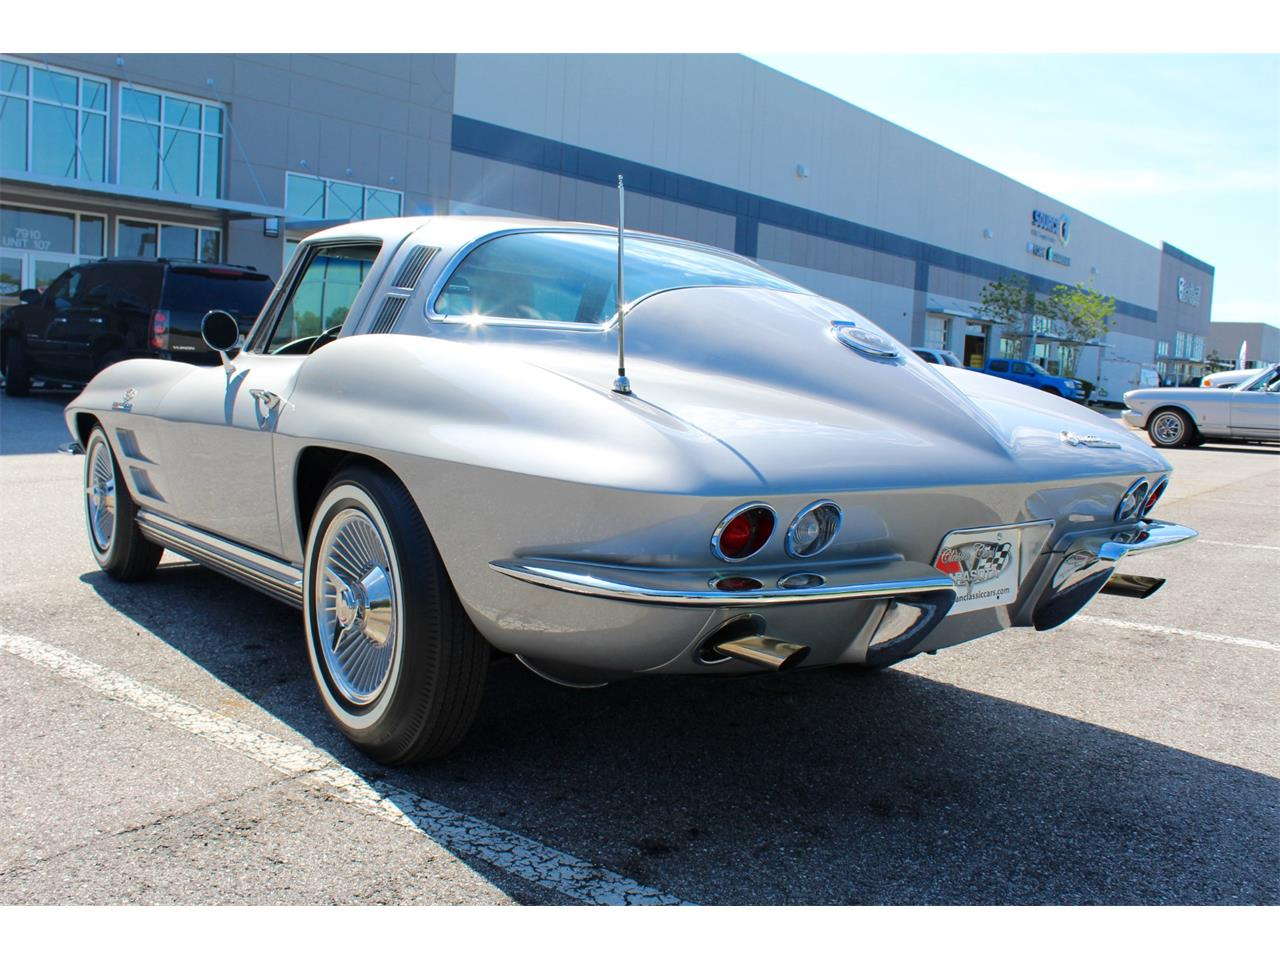 1964 chevrolet corvette stingray for sale cc 1084215. Black Bedroom Furniture Sets. Home Design Ideas